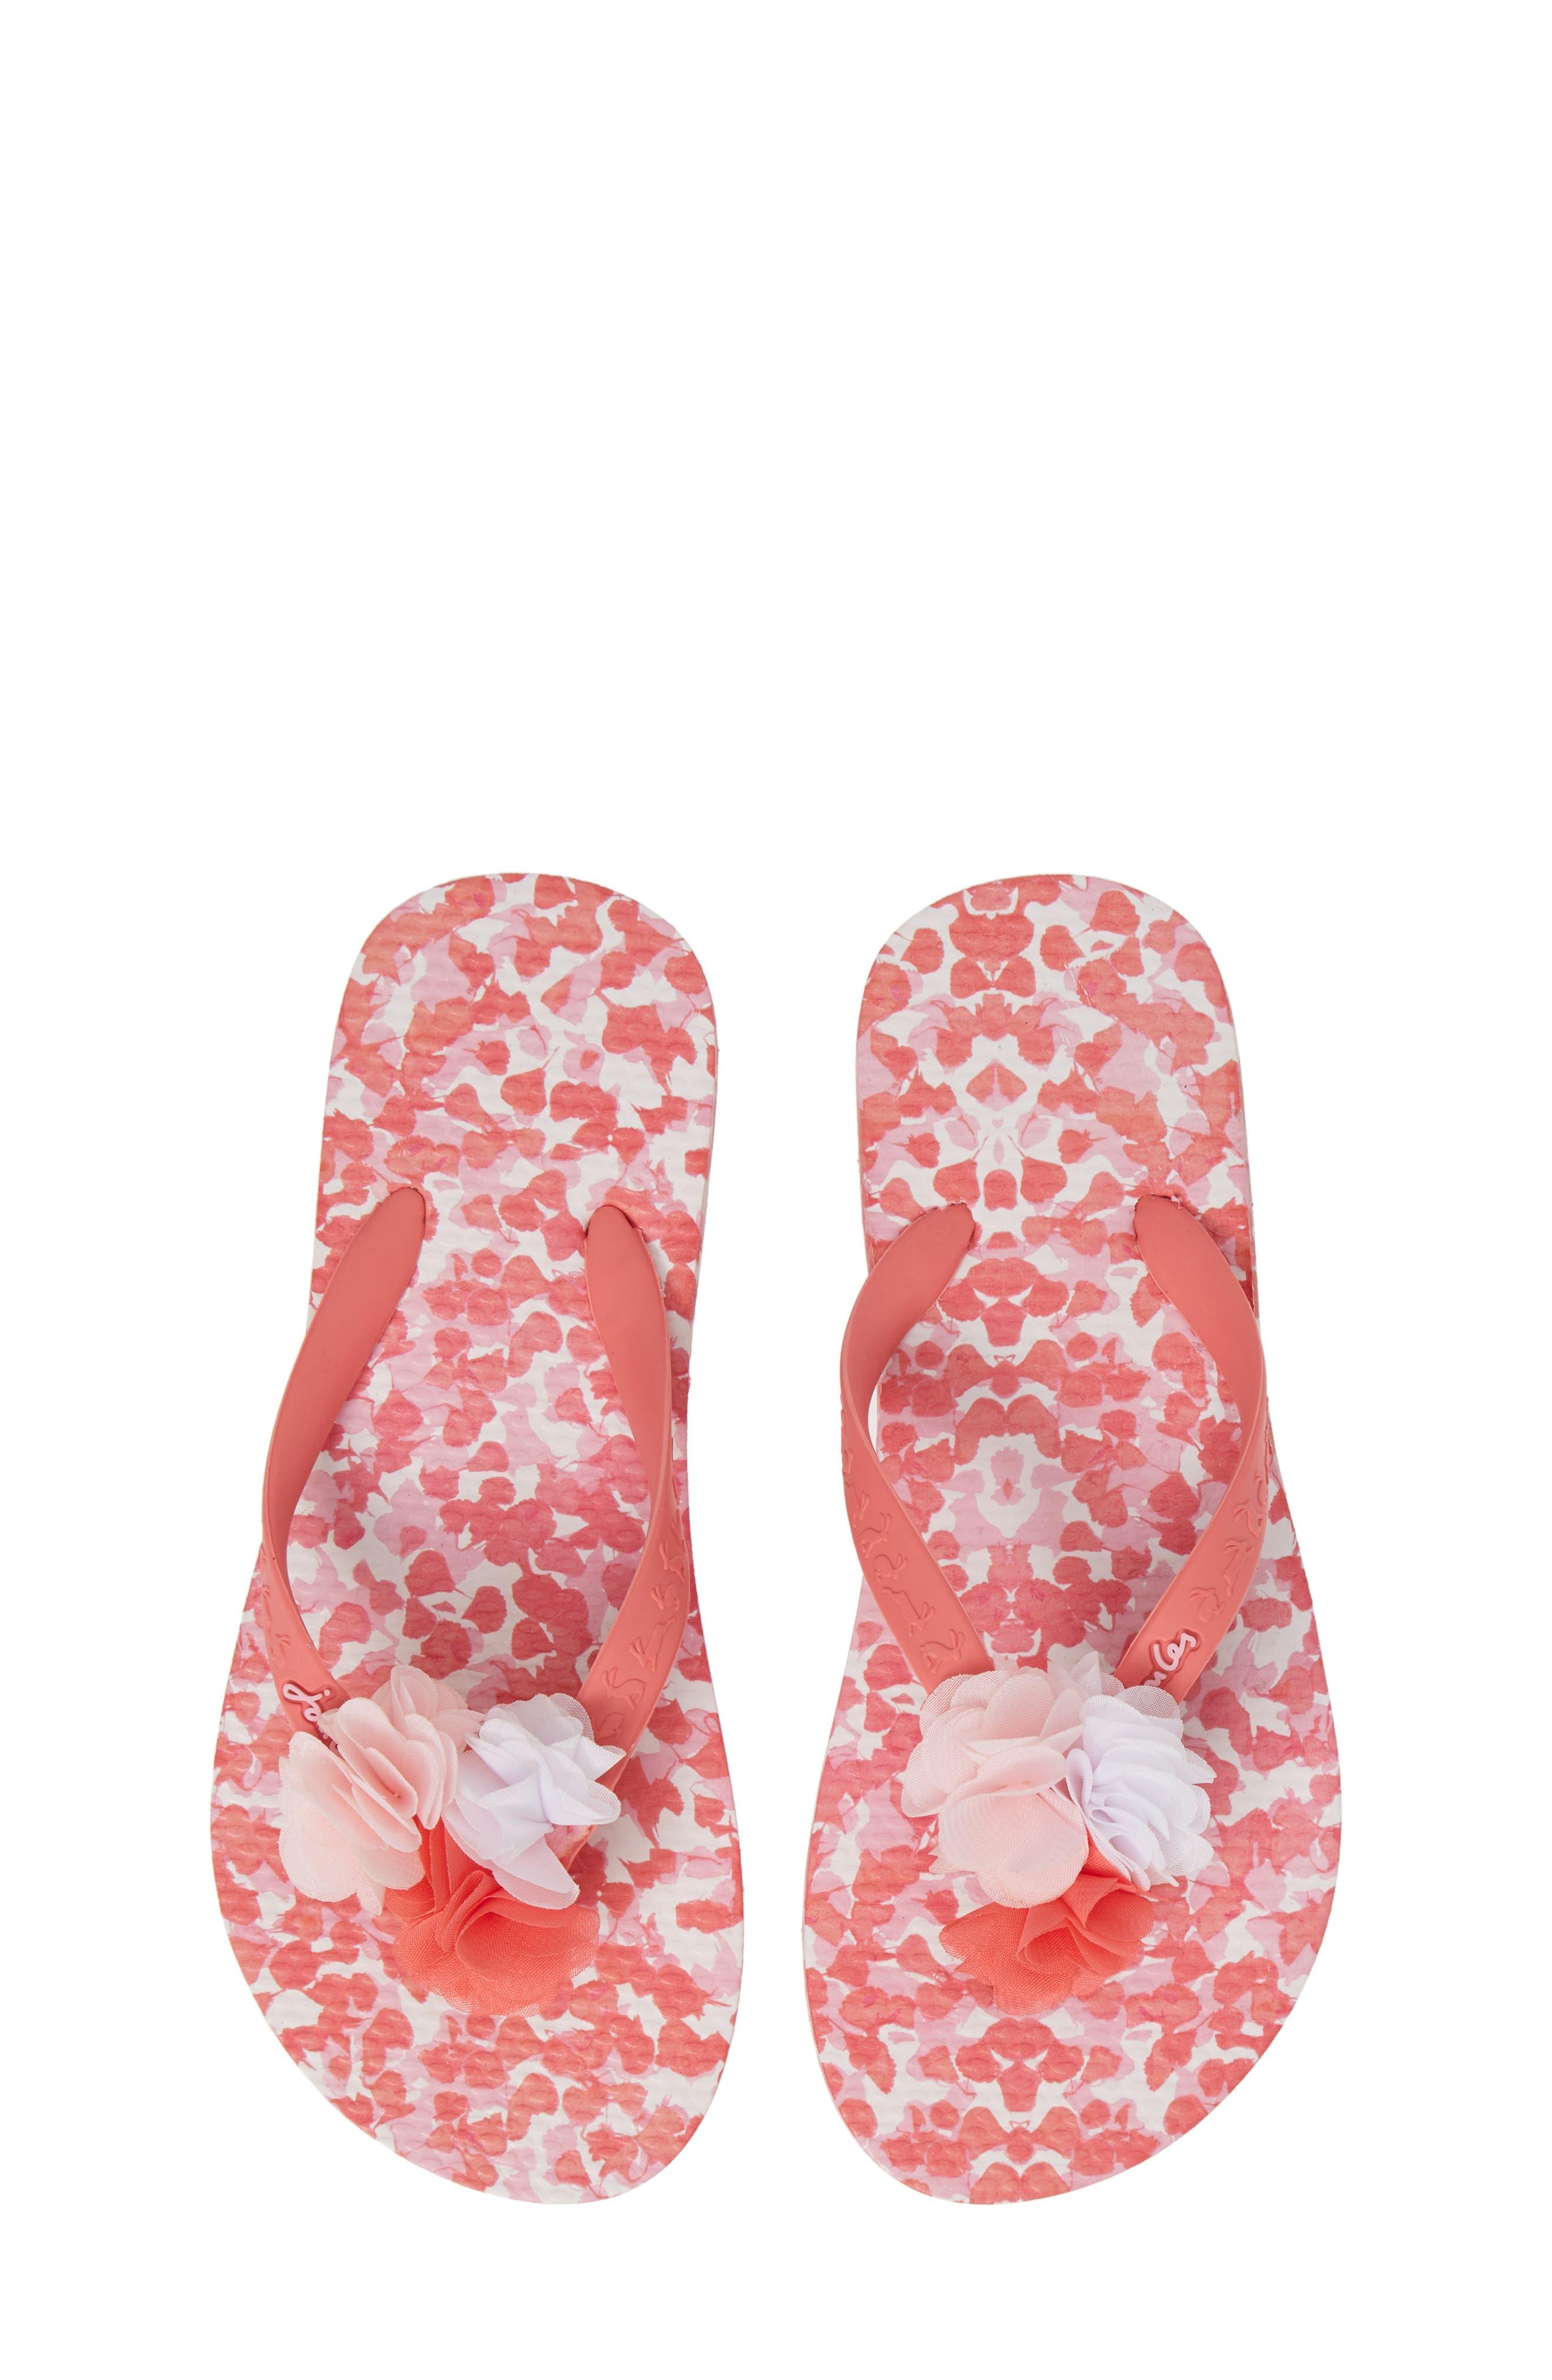 Girls Joules Floral Flip Flop Sandal